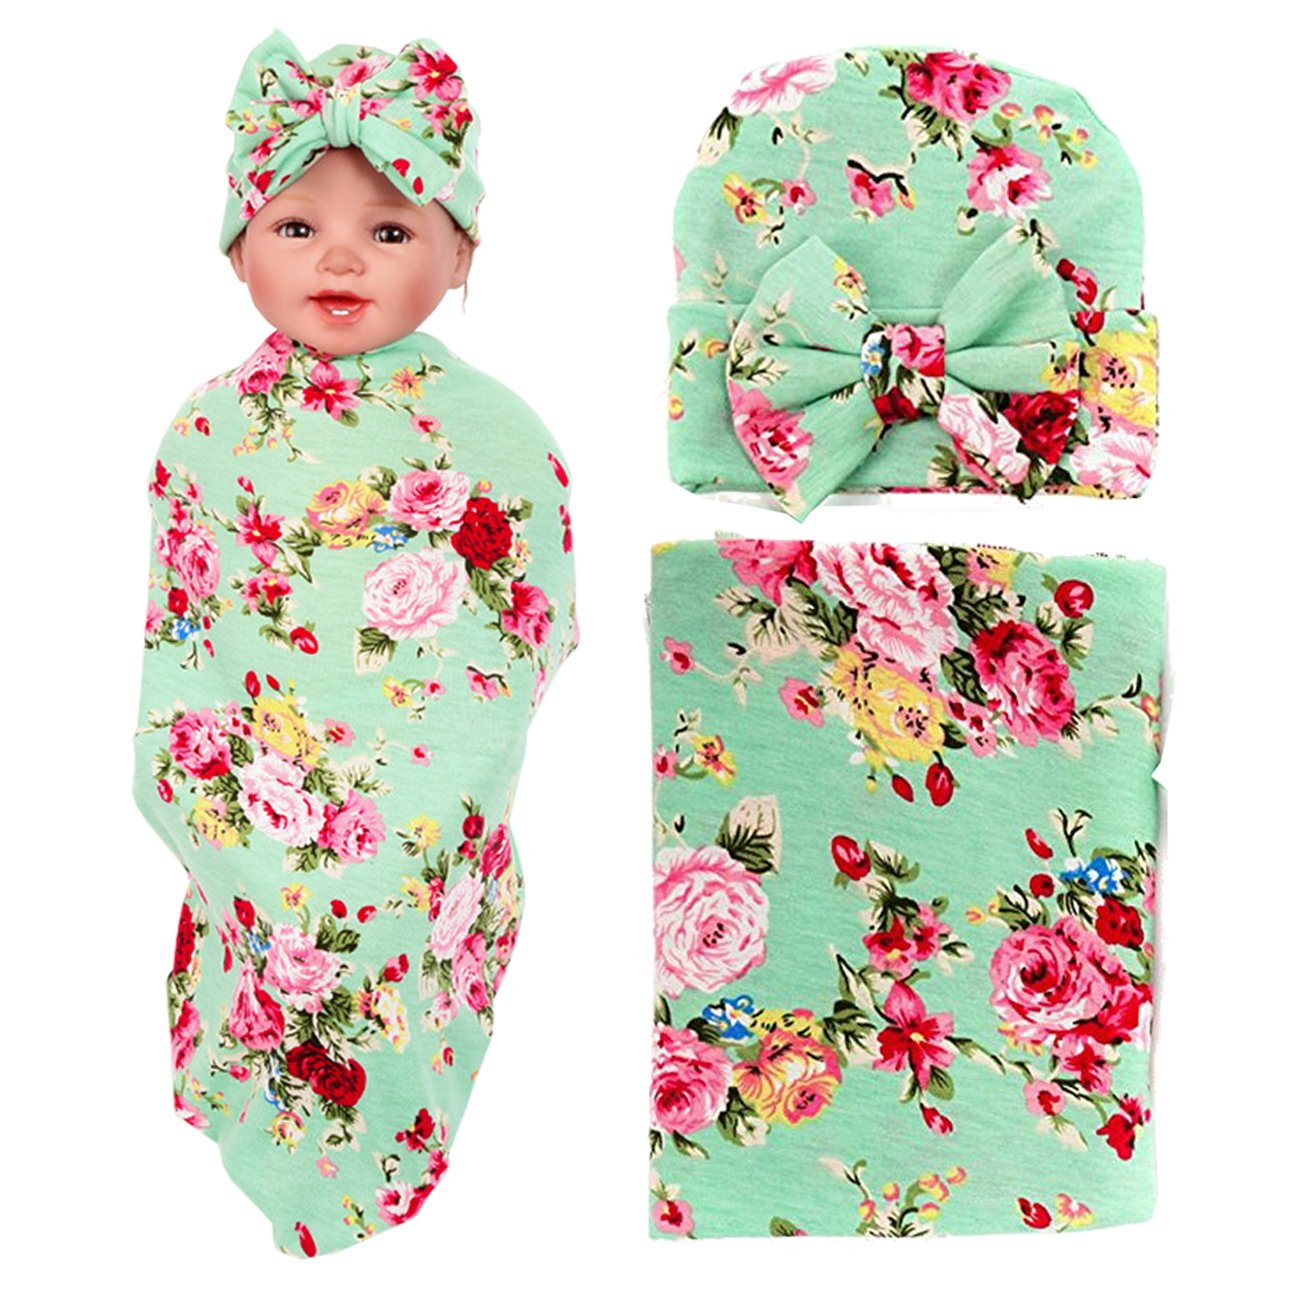 1 Pack Newborn Floral Swaddle BQUBO Receiving Blanket with Headbands Hats Sleepsack Toddler Warm